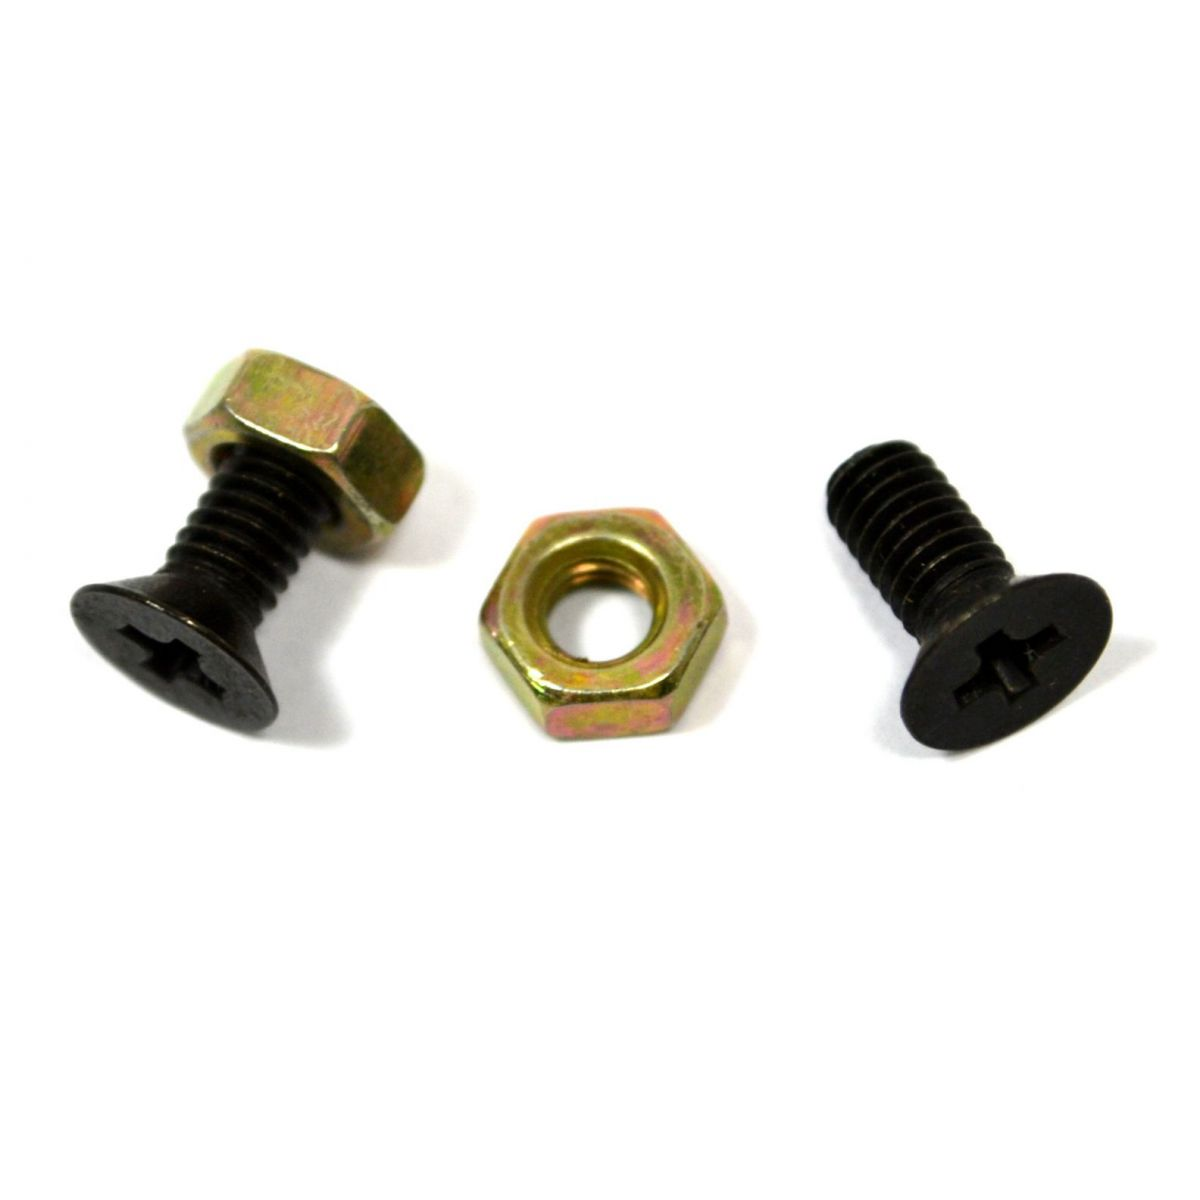 Parafuso preto para nut (9mm x 4mm) - Kit c/ 2 peças  - Luthieria Brasil